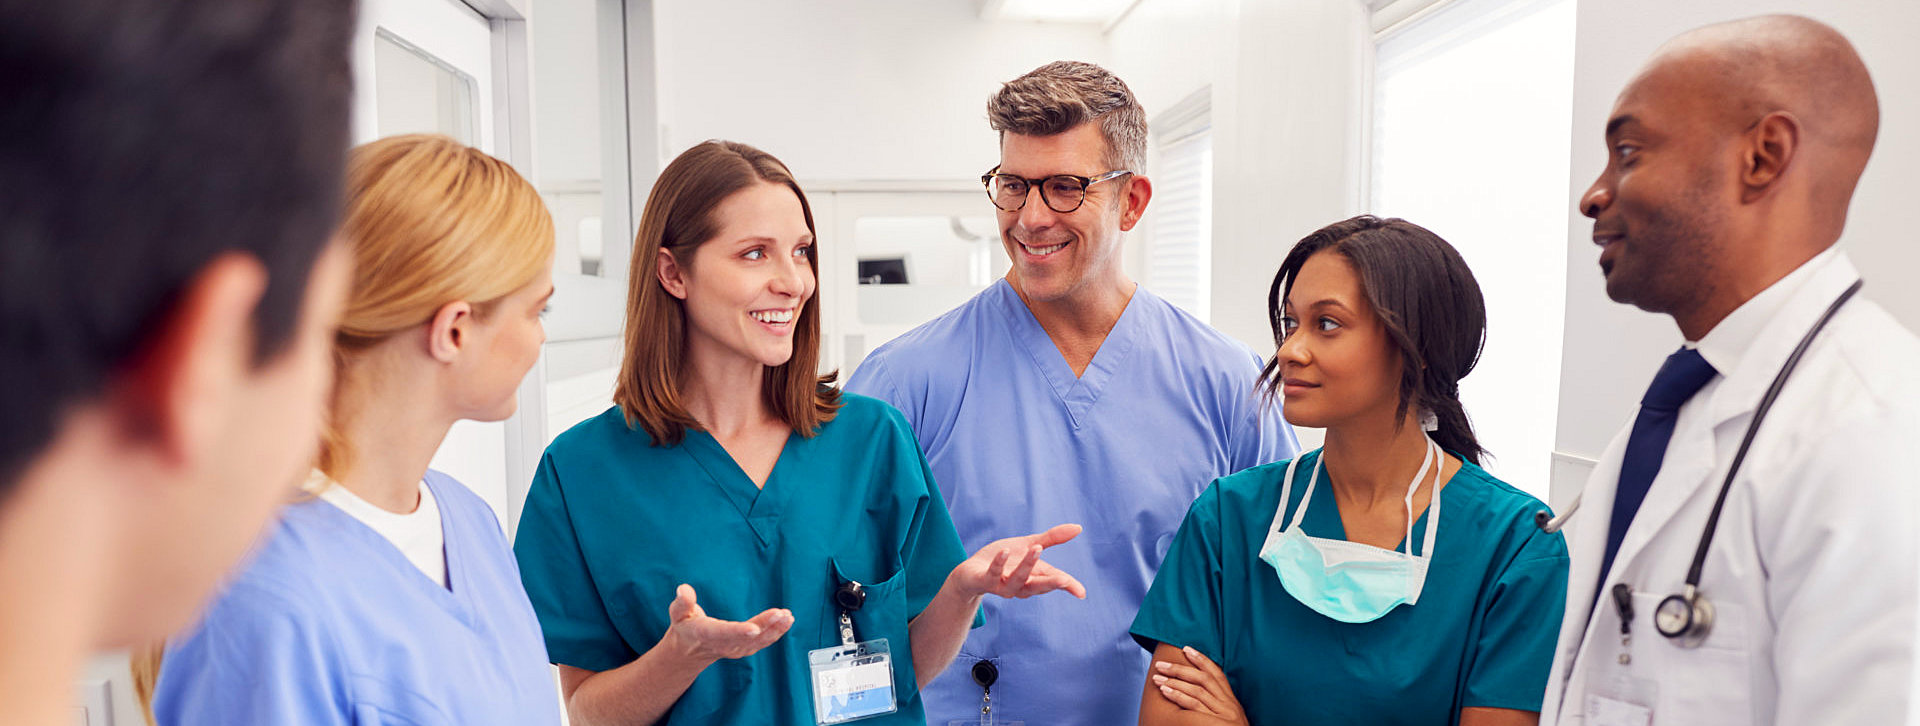 medical staff having a meeting